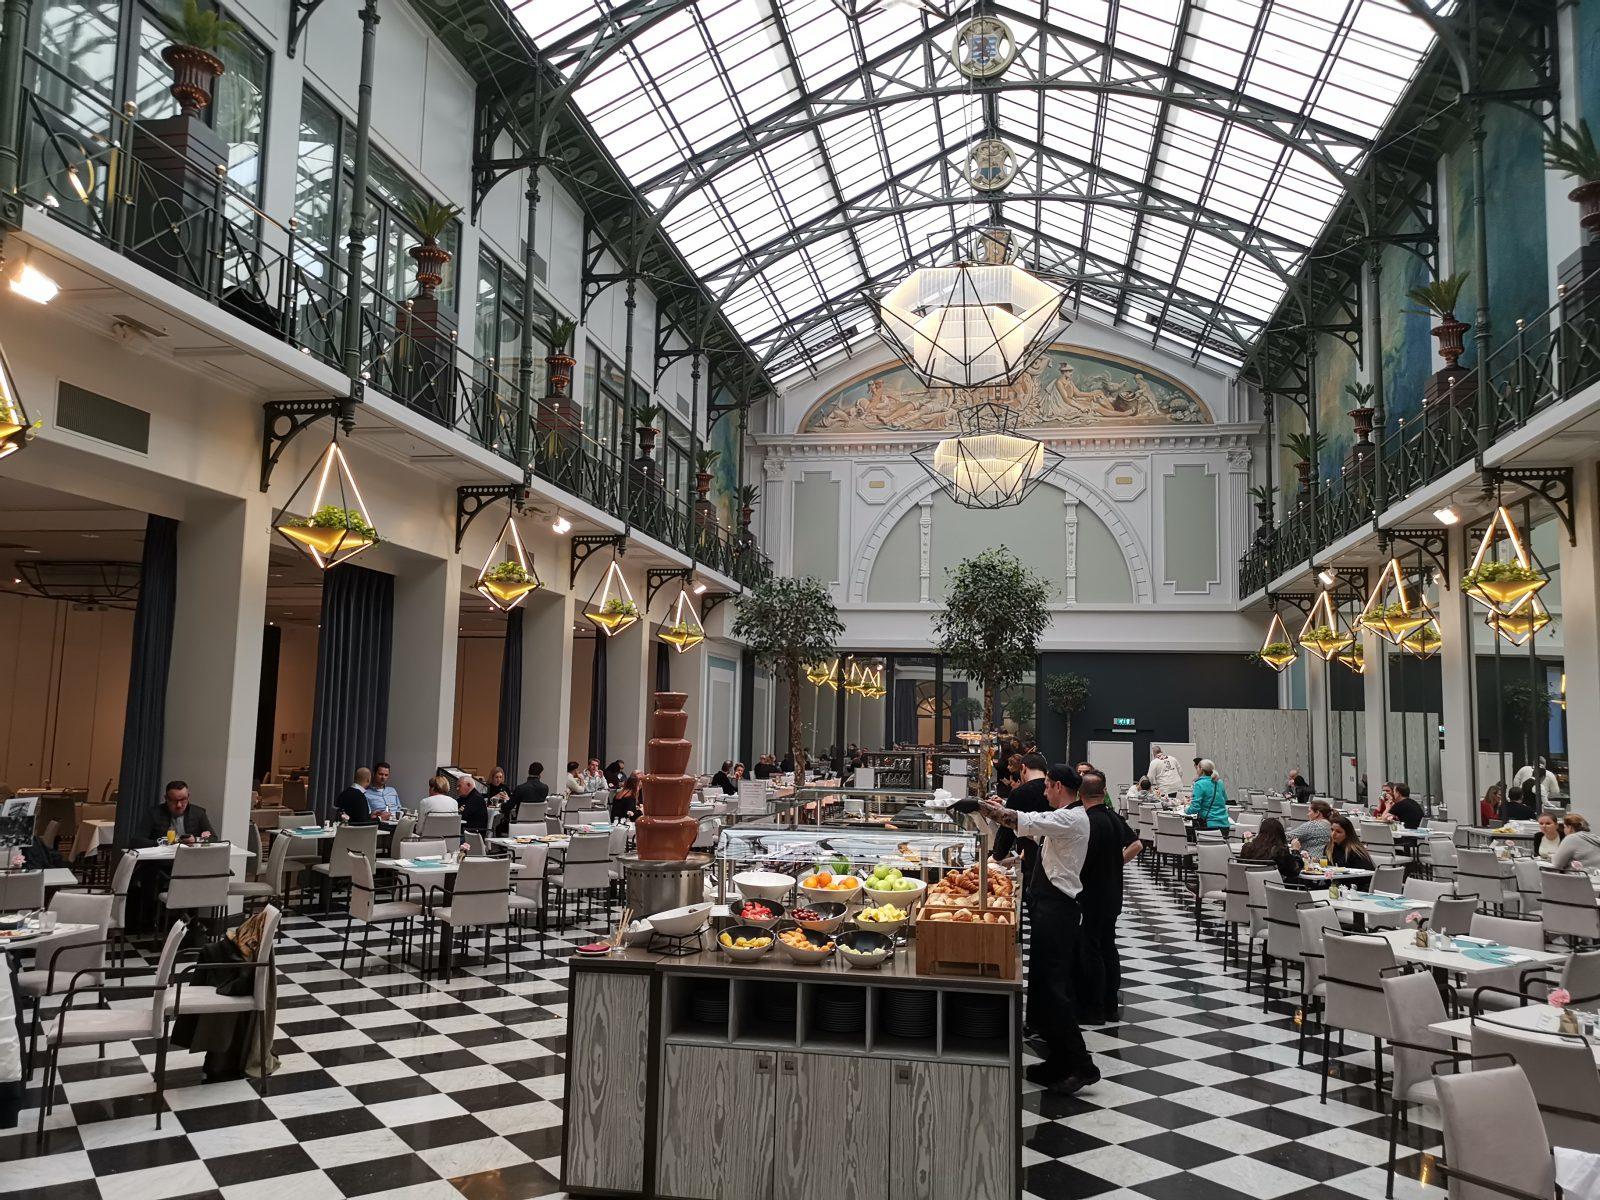 NH コレクション アムステルダム グランド ホテル クラスナポルスキーの朝食会場